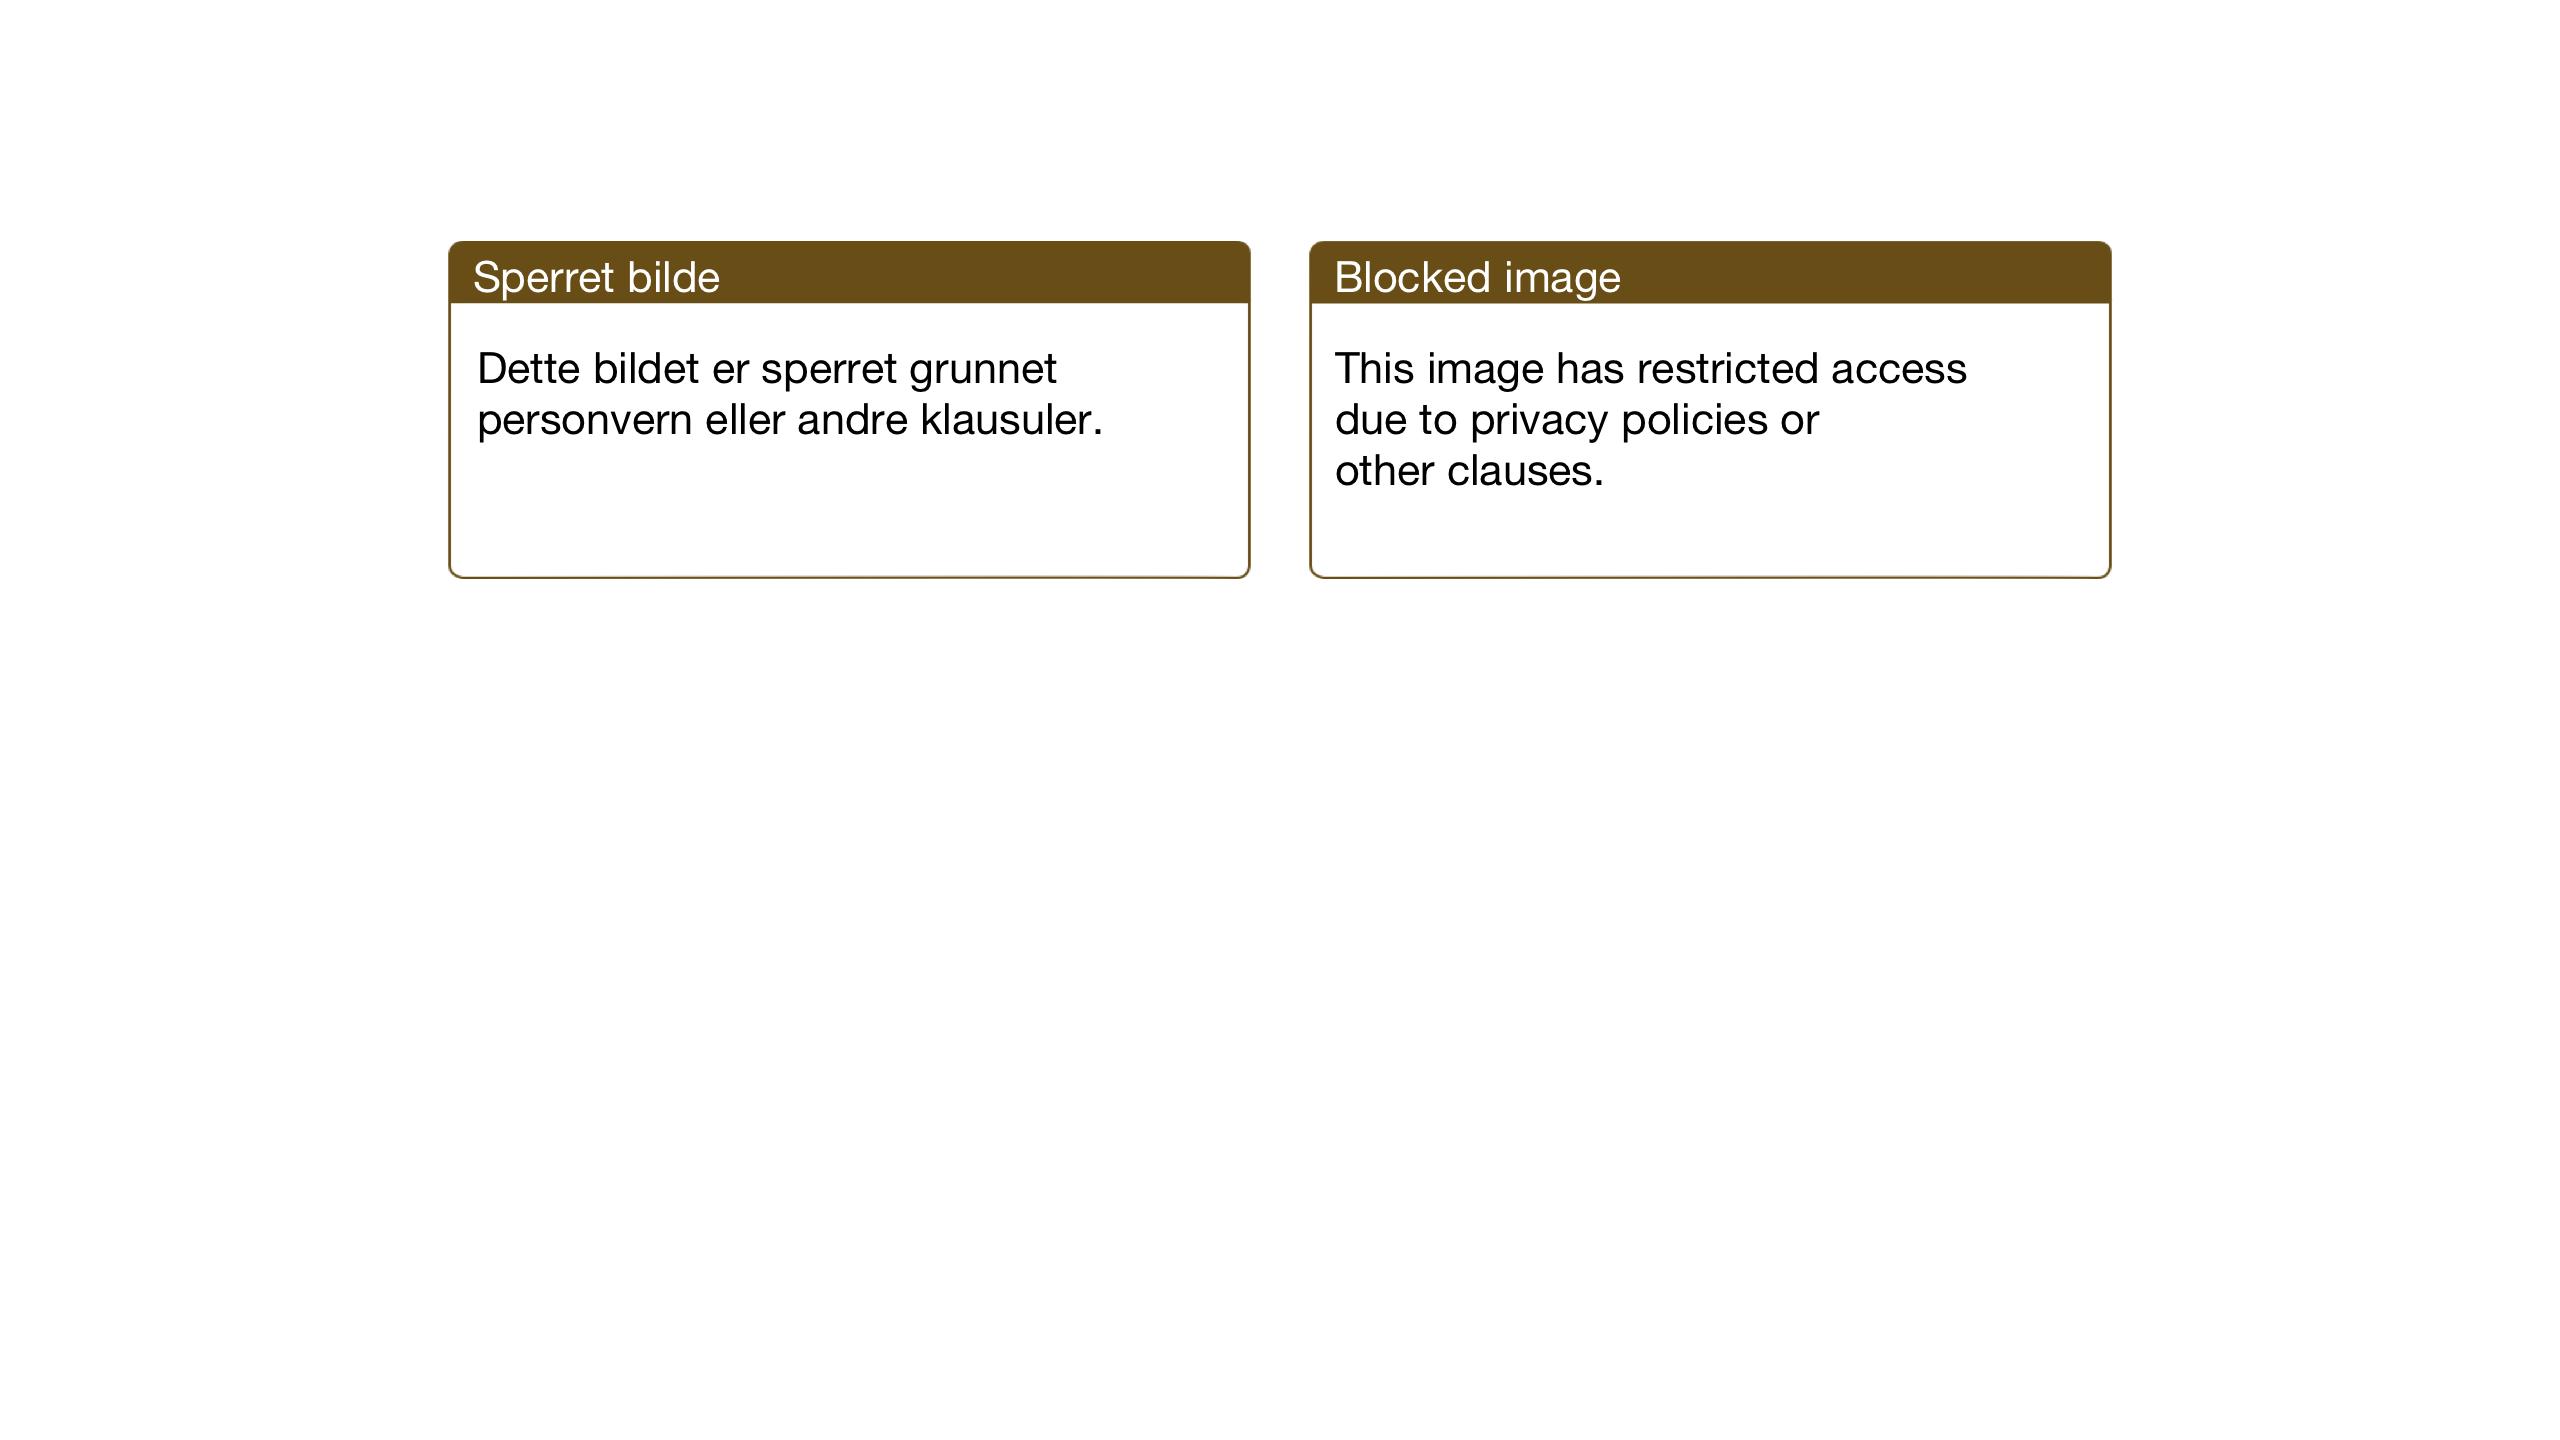 SAB, Domkirken Sokneprestembete, H/Haa: Ministerialbok nr. C 9, 1958-2001, s. 165b-166a